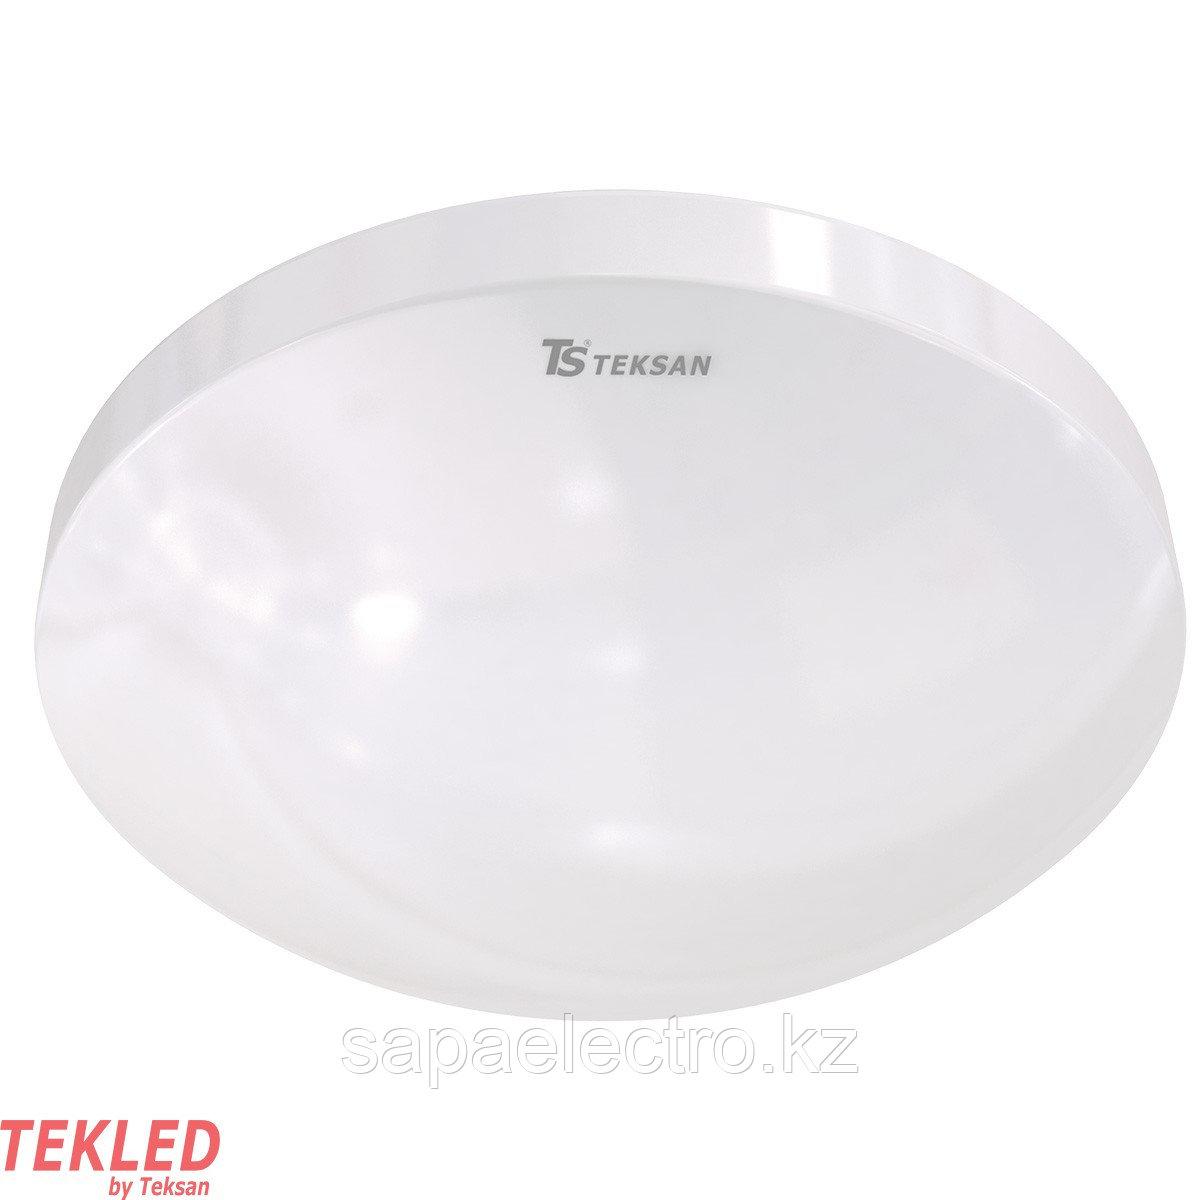 Свет-к LED OMEGA STANDART 22W 4000K 380мм MGL1/10шт